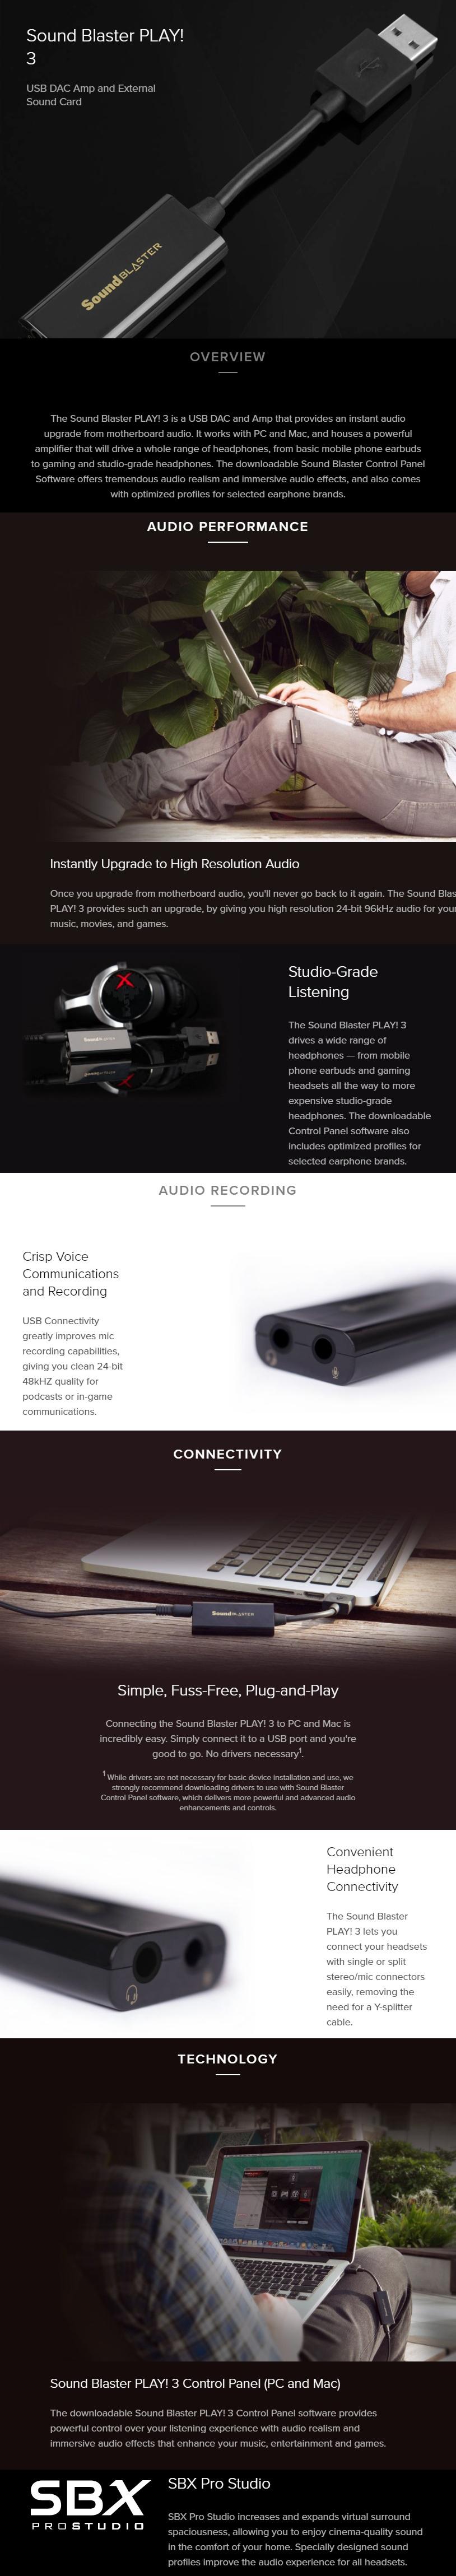 Creative Sound Blaster Play 3